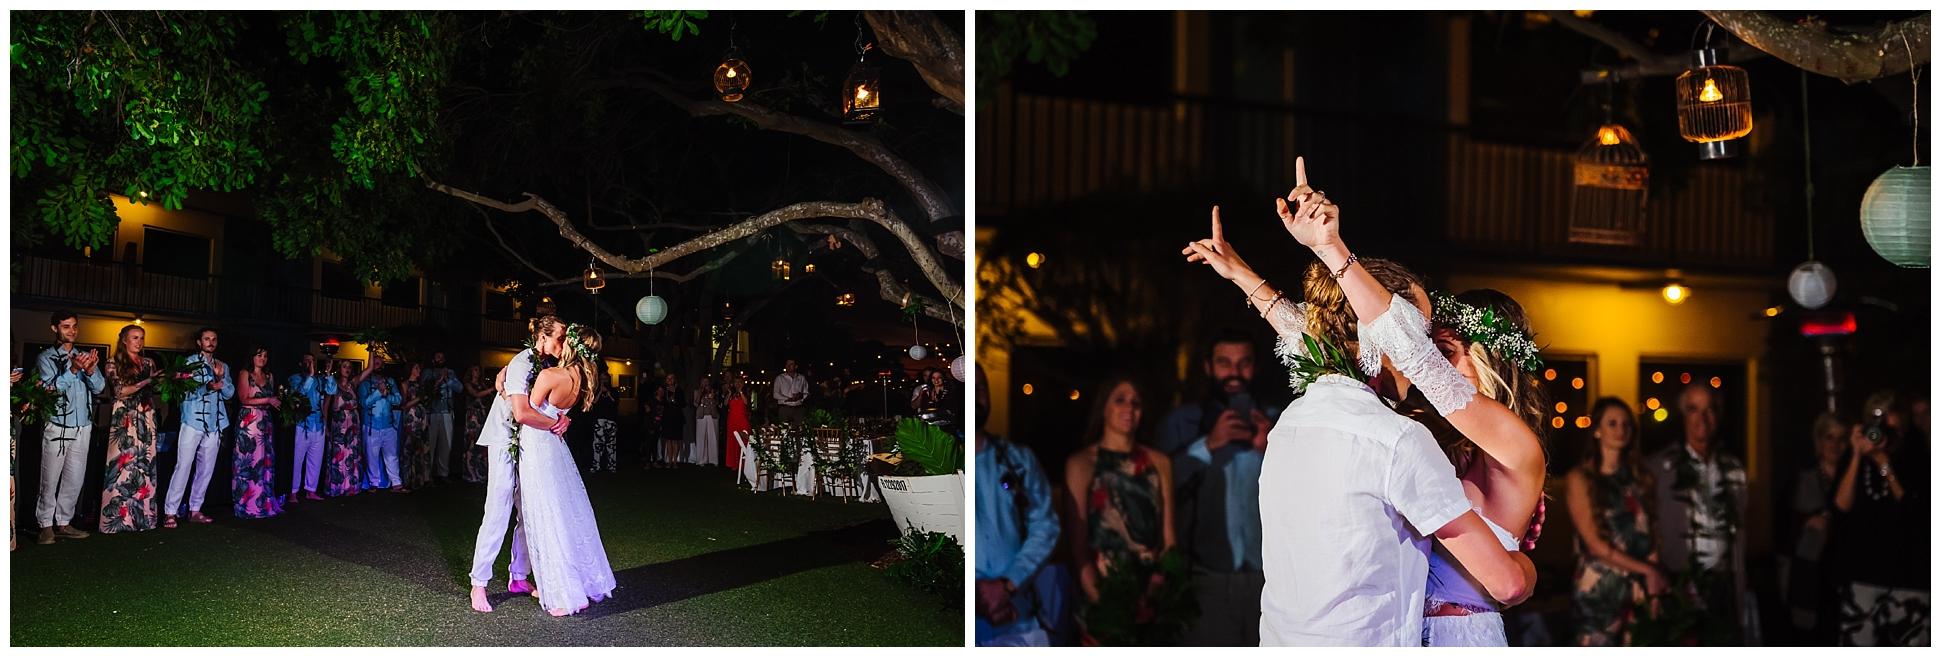 tampa-bay-wedding-photographer-barefoot-post-card-inn-tropical-hawaiin-lei-pink-pineapples-flower-crown_0198.jpg